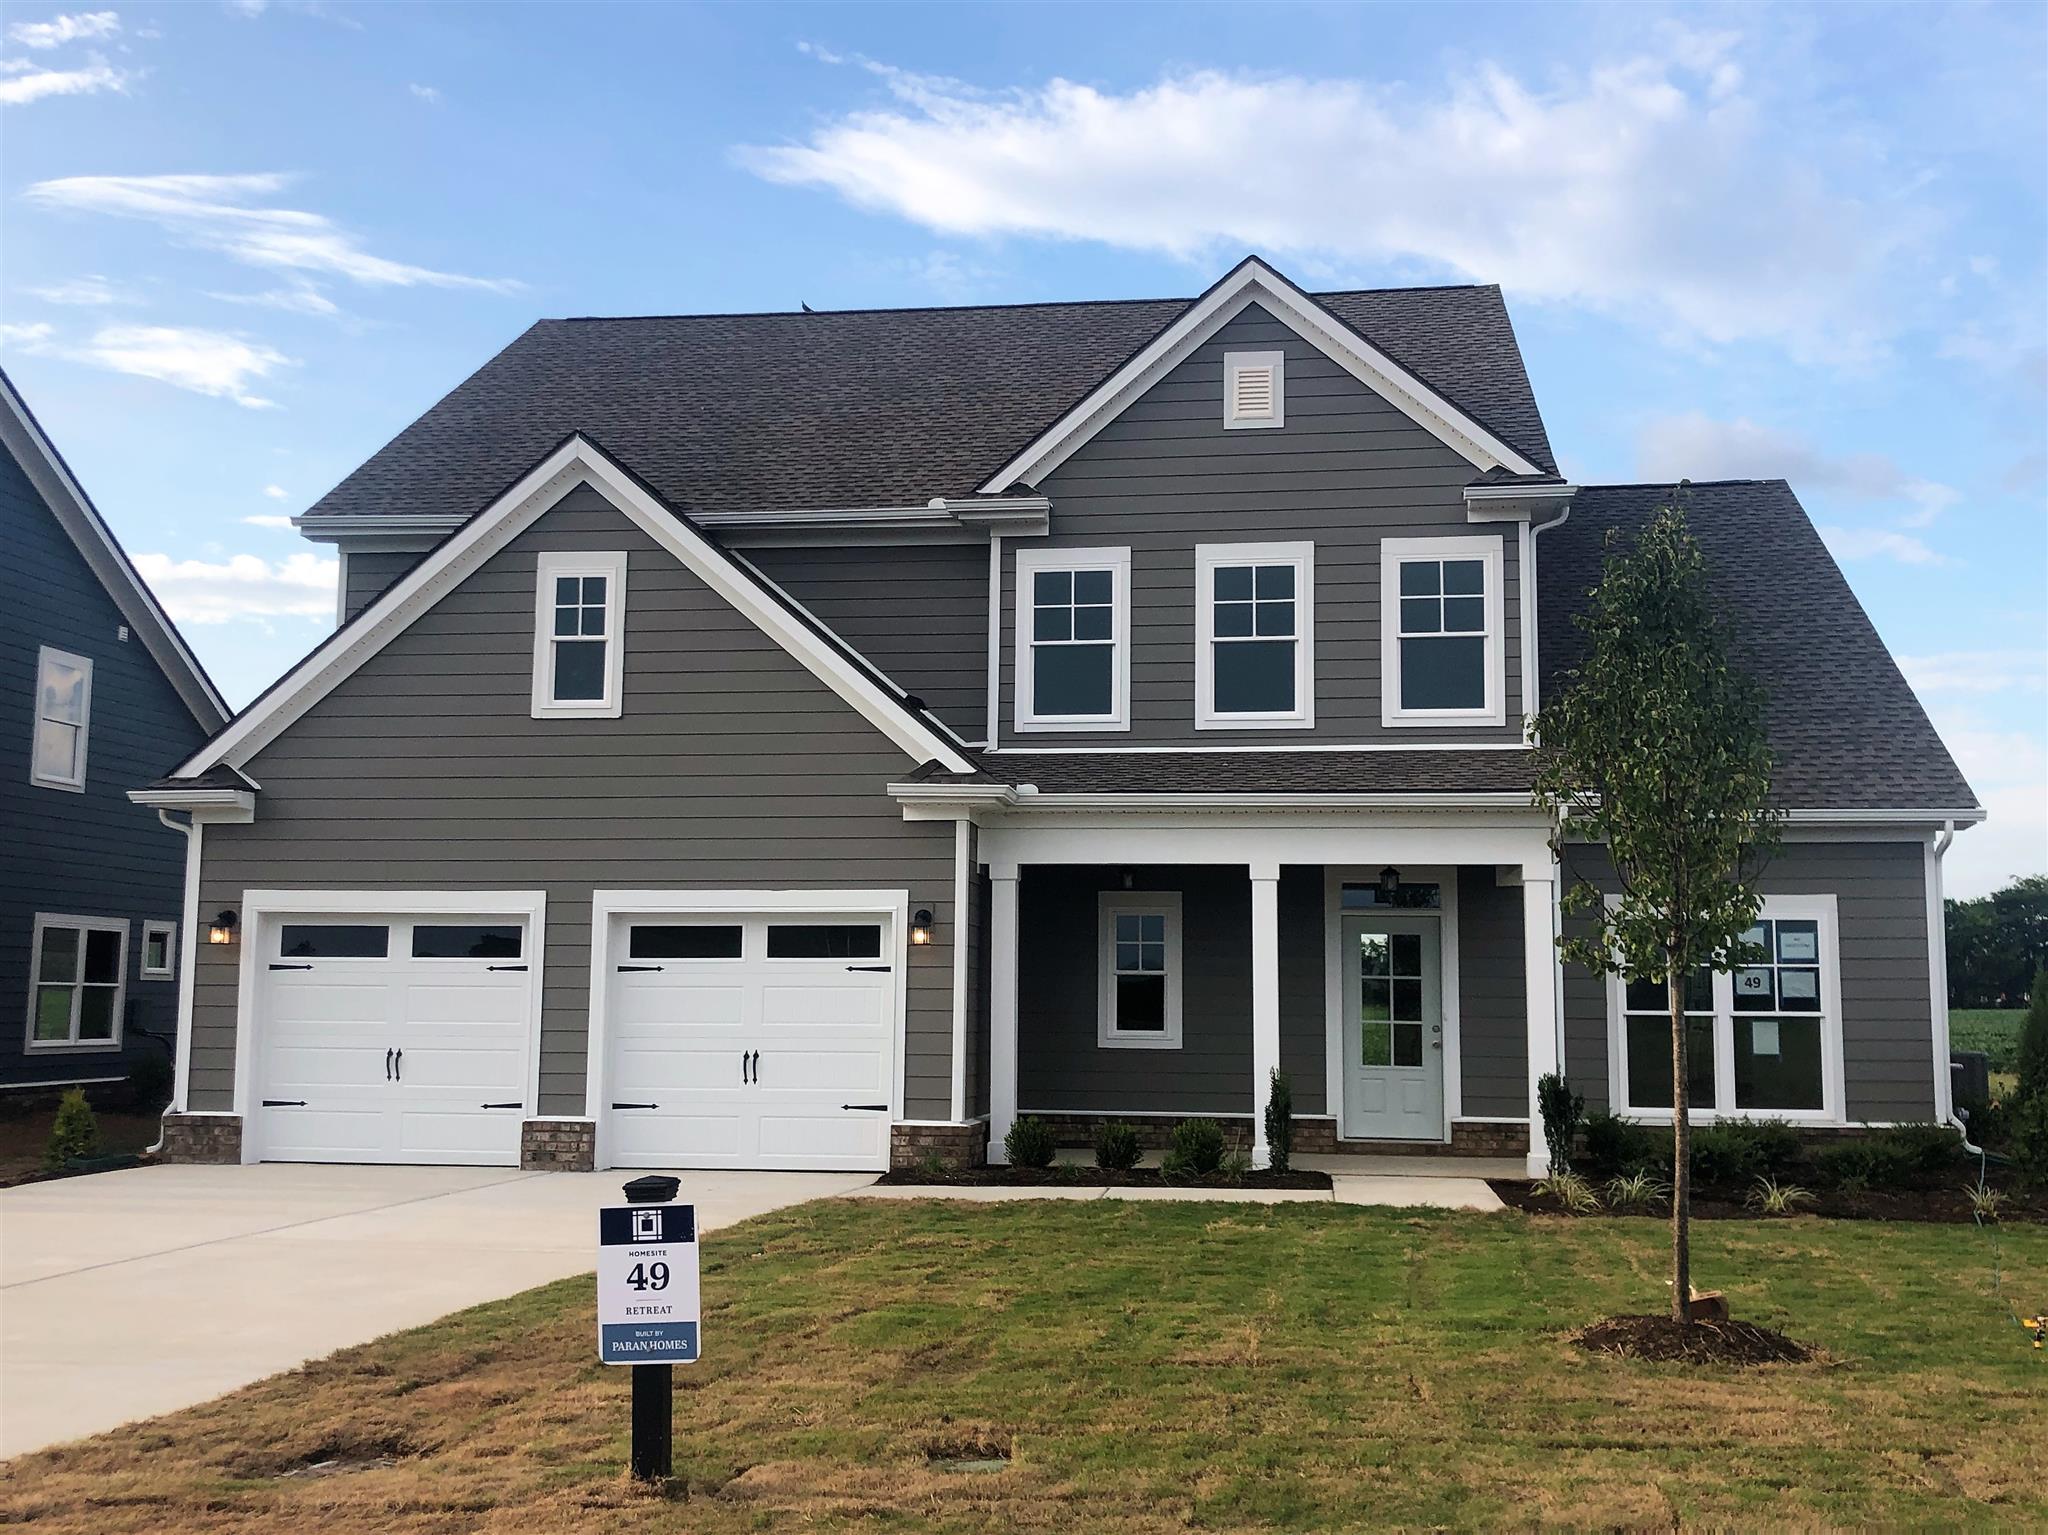 5536 Shelton Boulevard #49, Murfreesboro, TN 37129 - Murfreesboro, TN real estate listing